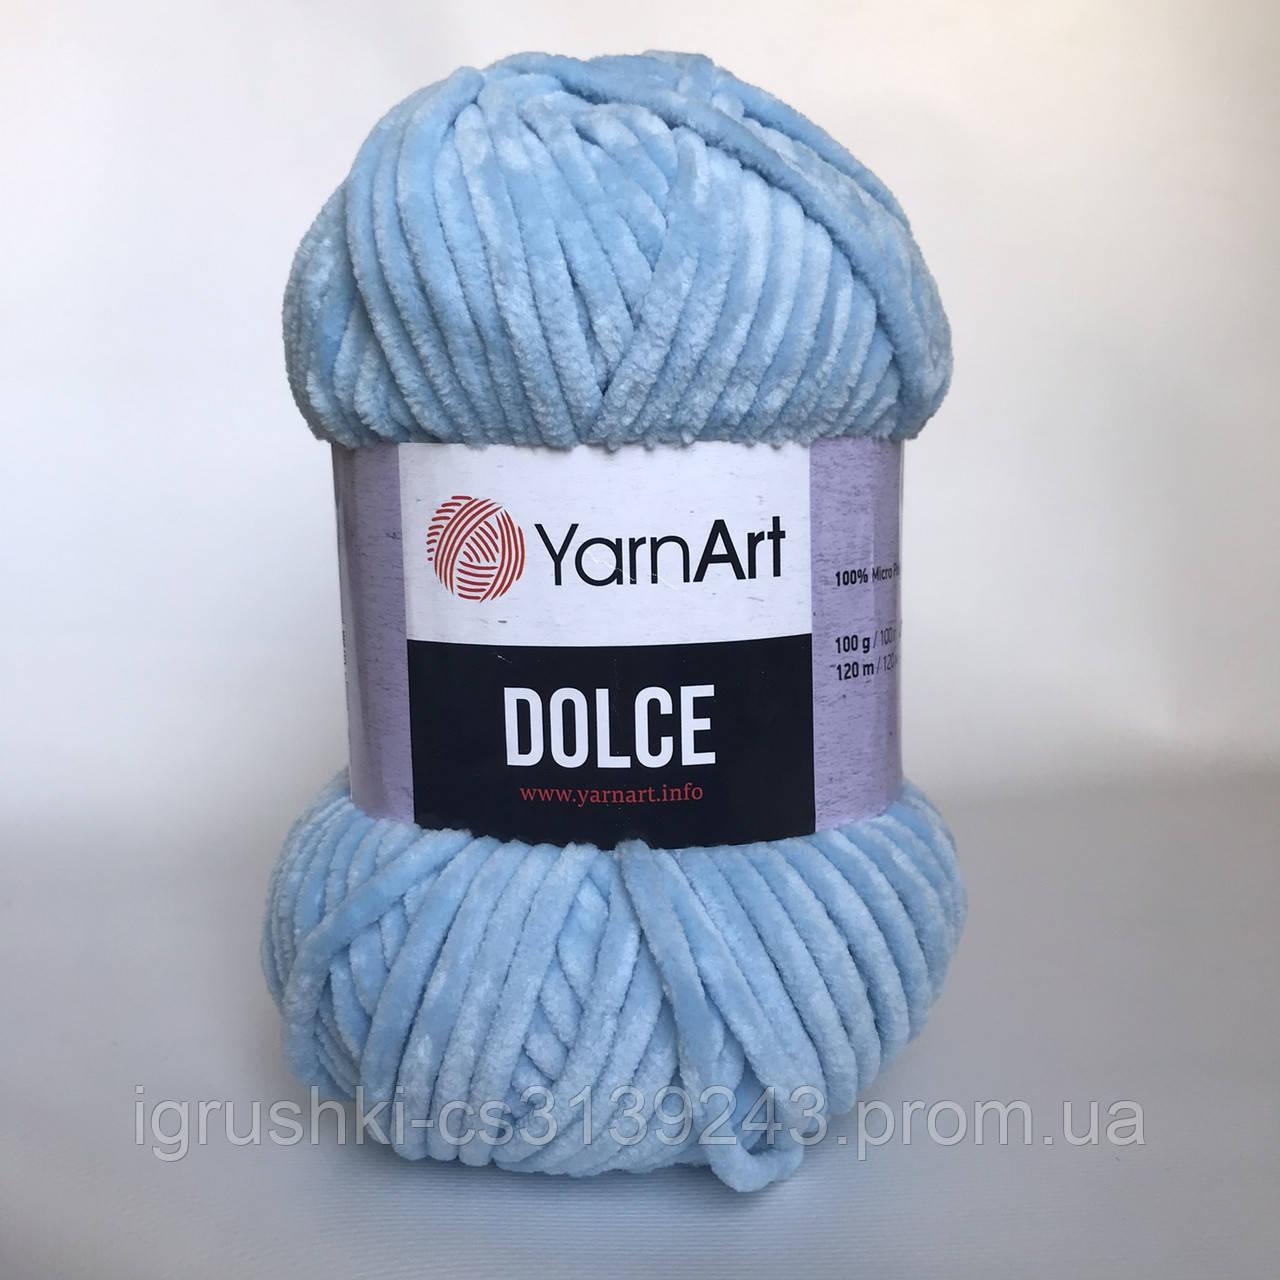 Плюшевая пряжа YarnArt Dolce 749 (ЯрнАрт Дольче) Голубой